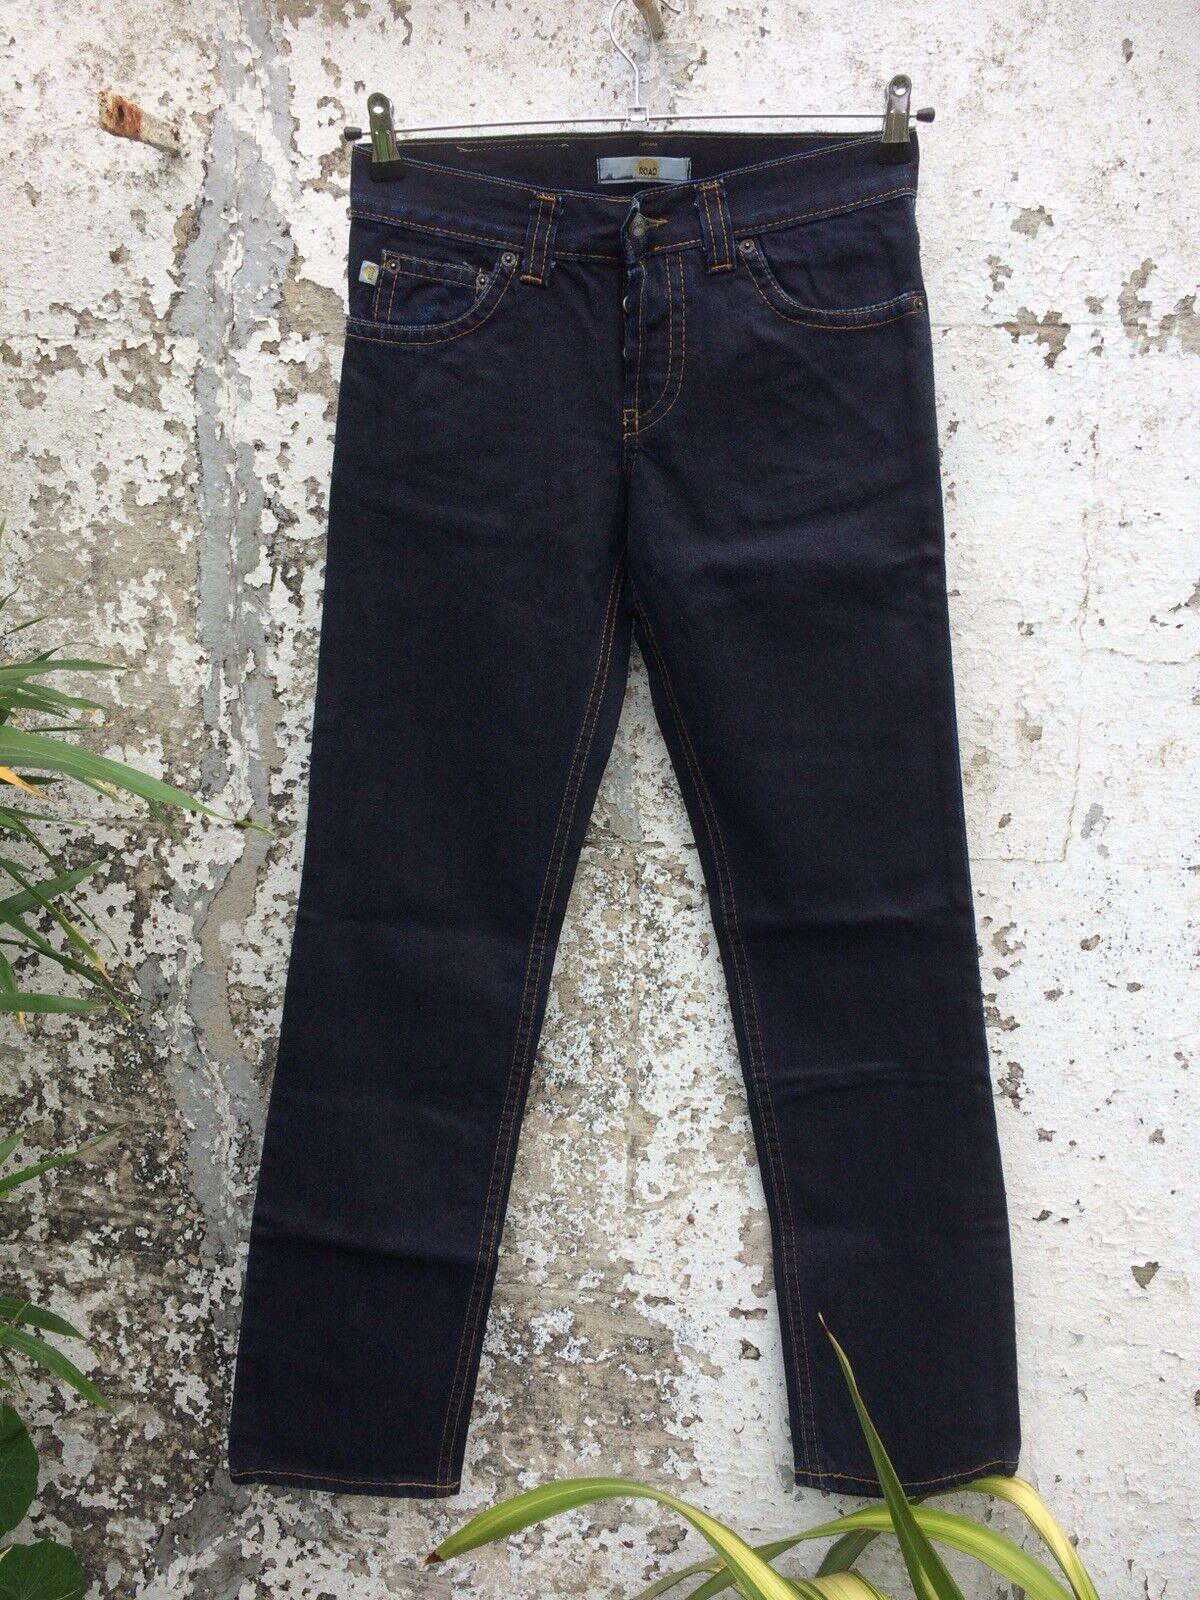 Road Jeans Wax Denim Slim Pant Size 32 Reg